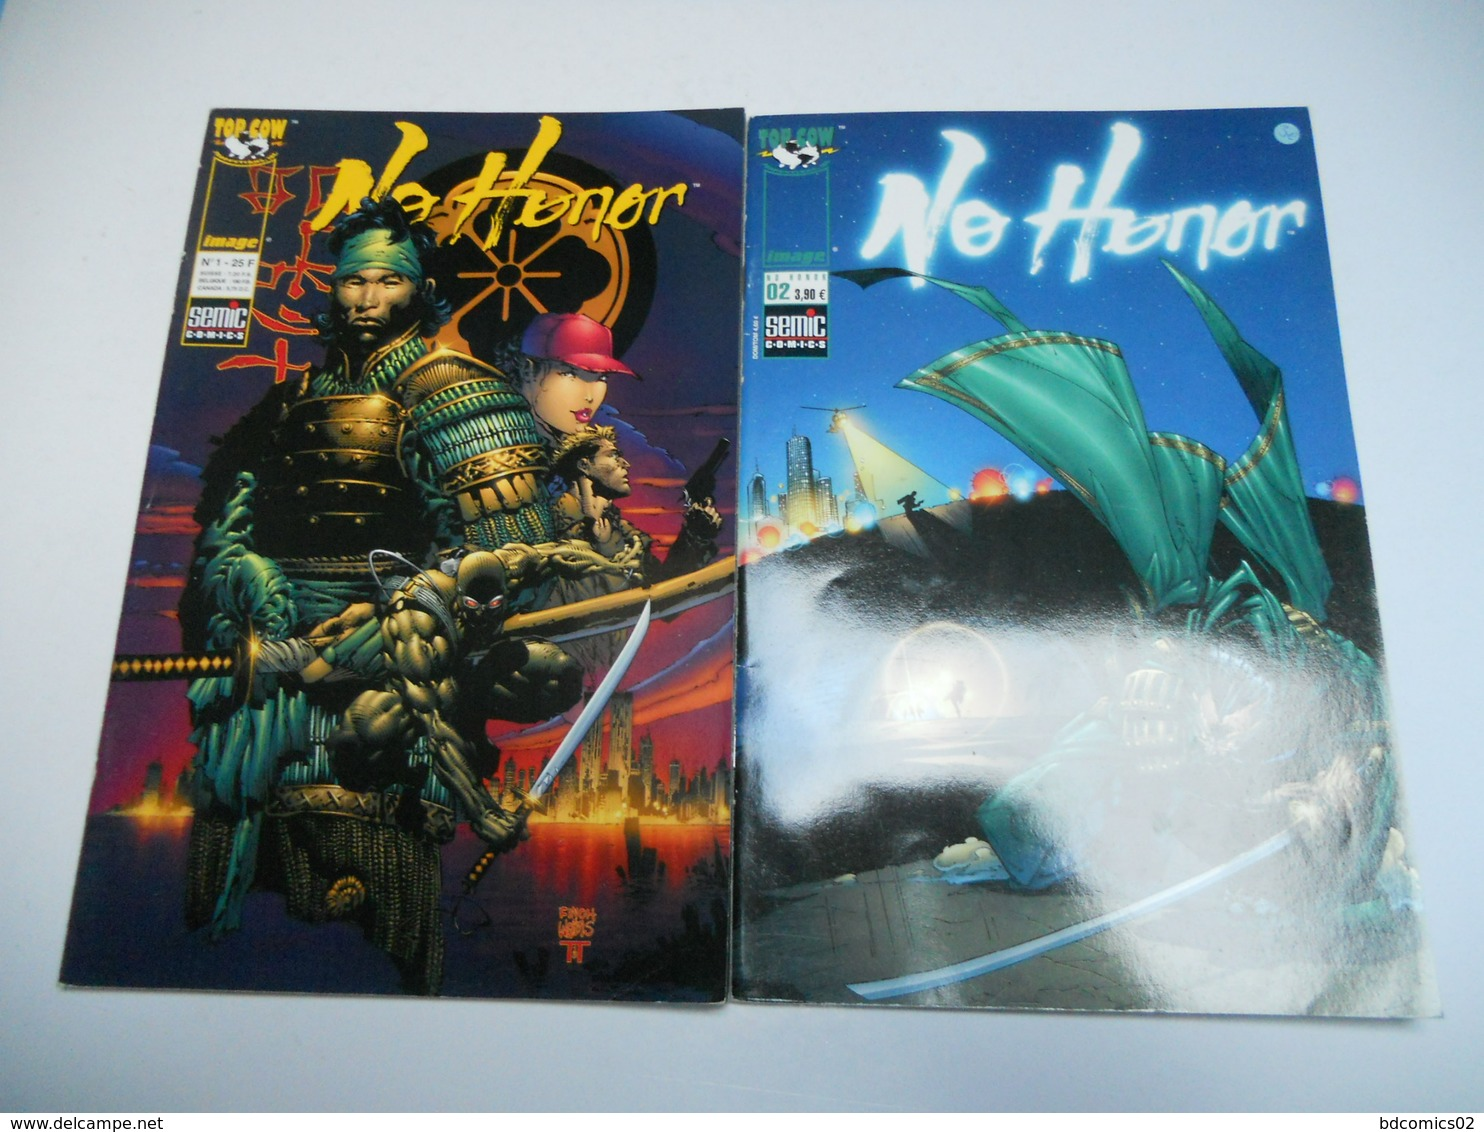 Lot De 2 Bd No Honor Senic N°1 Et N°2 Complet Tbe - Books, Magazines, Comics